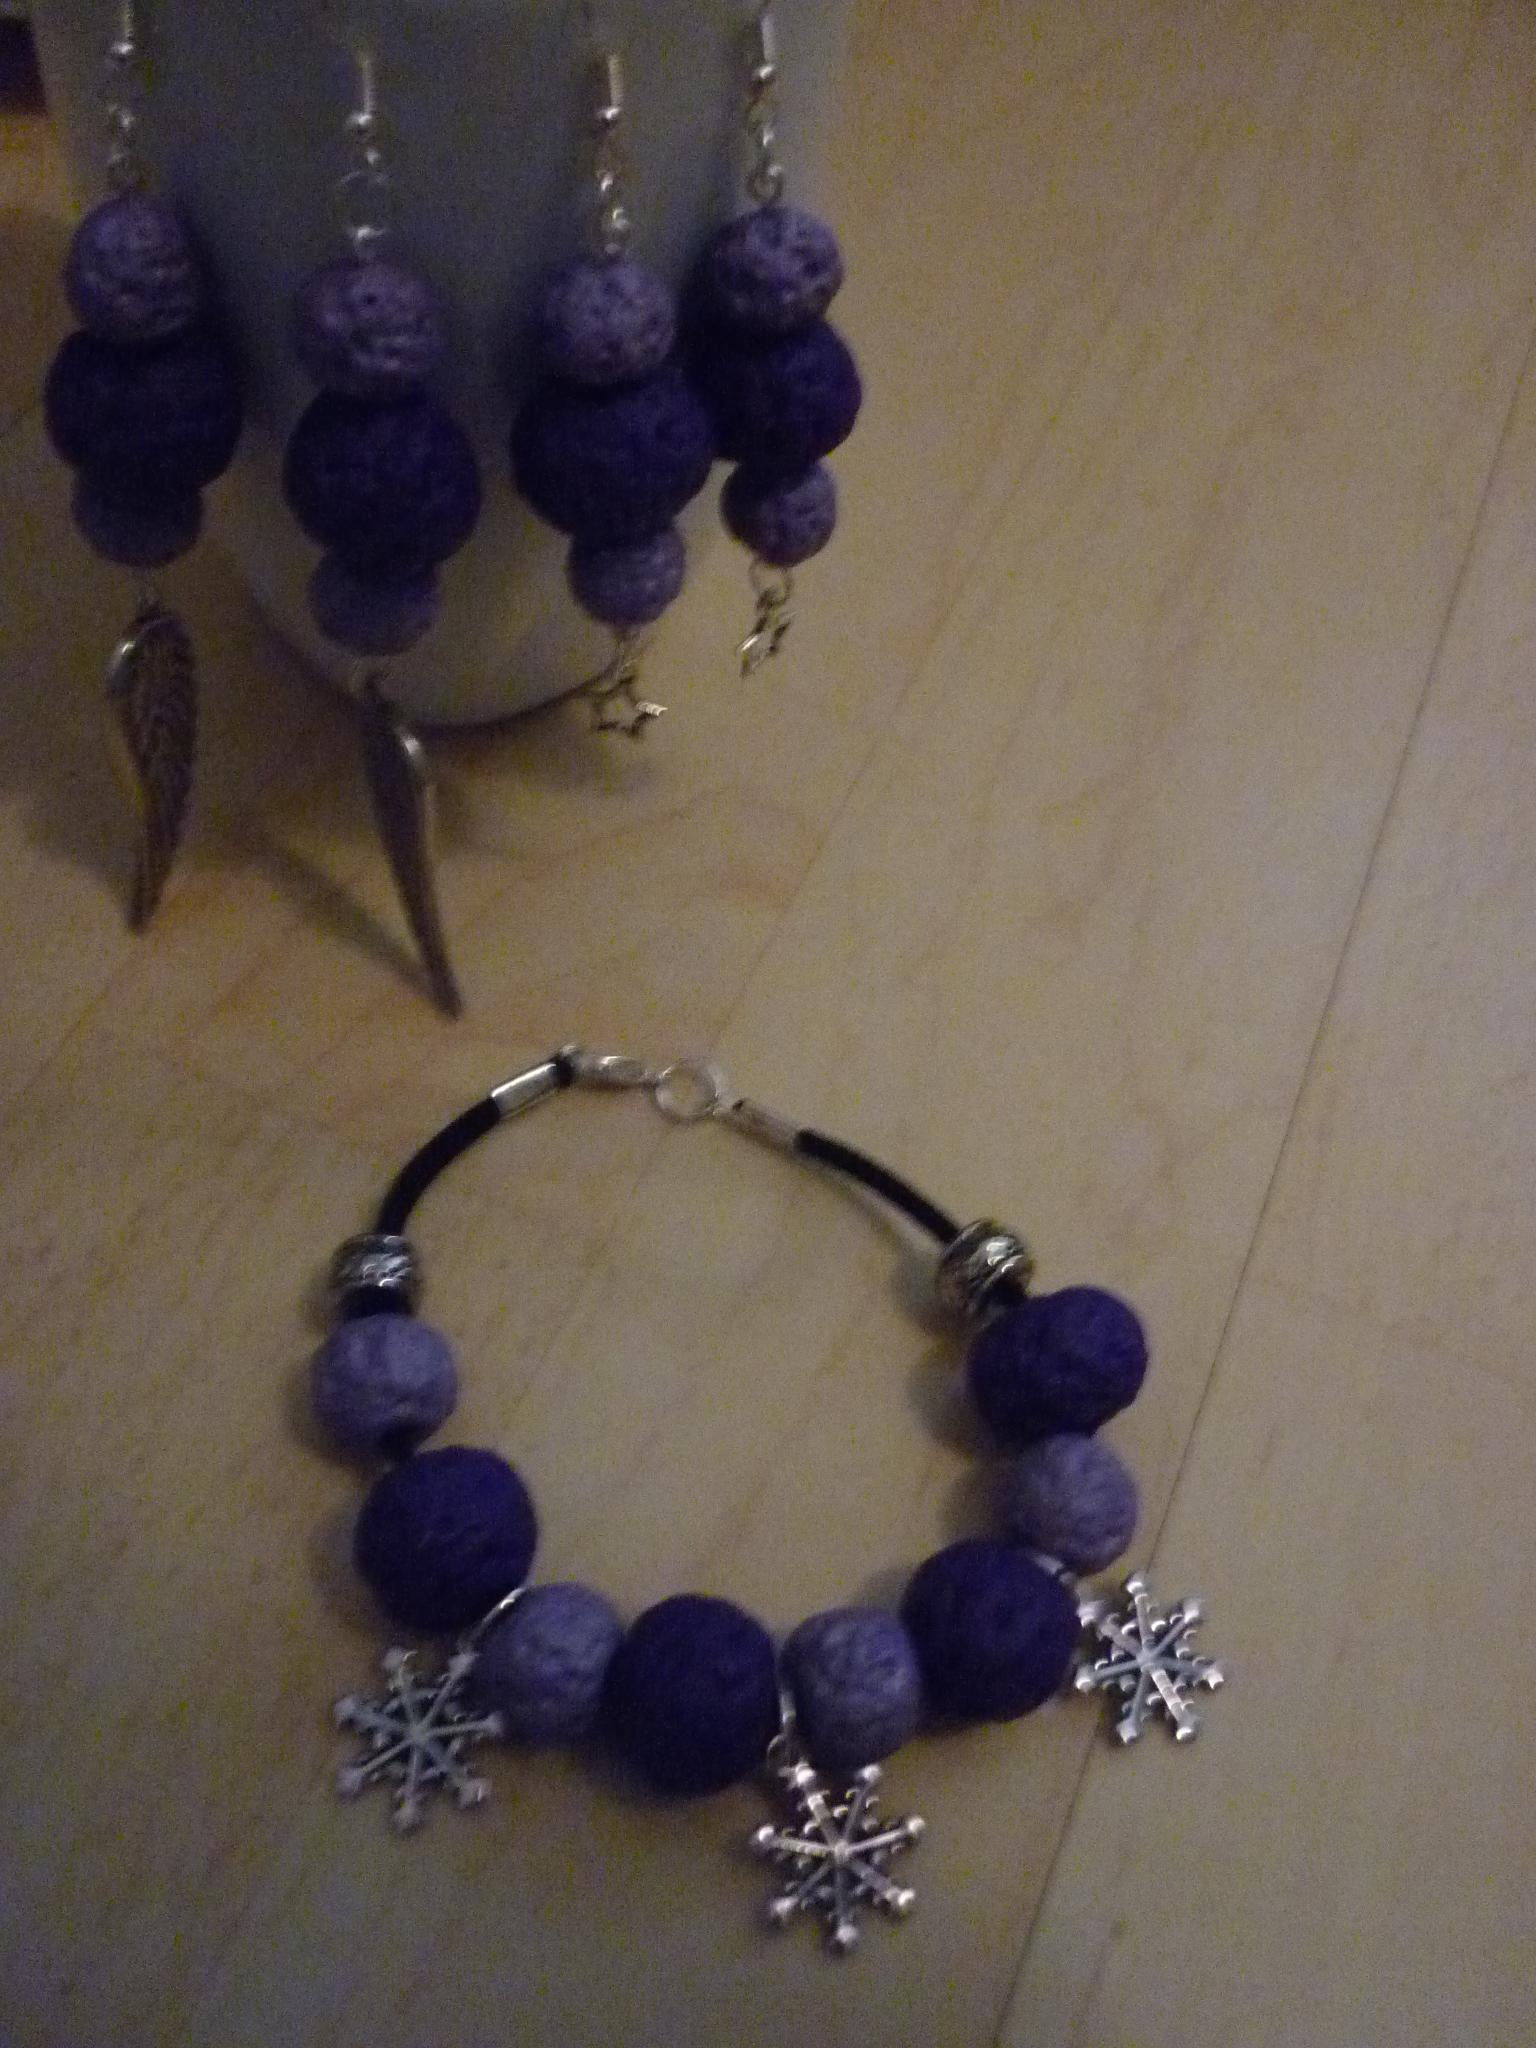 Armband  lila / violett  19.-  , Ohrenringe lila / violett je 15.-